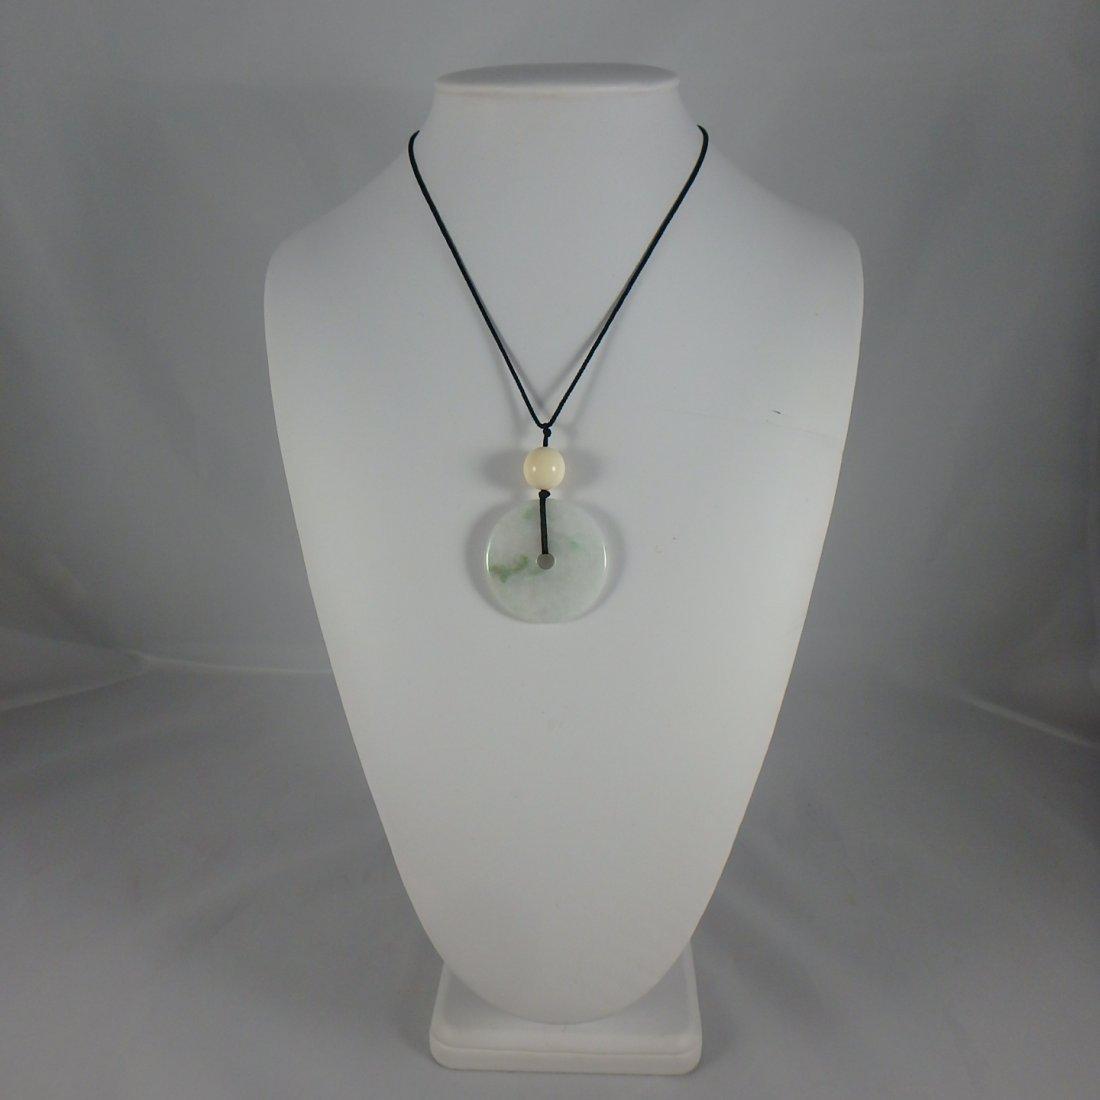 Jadeite Pendant/Necklace